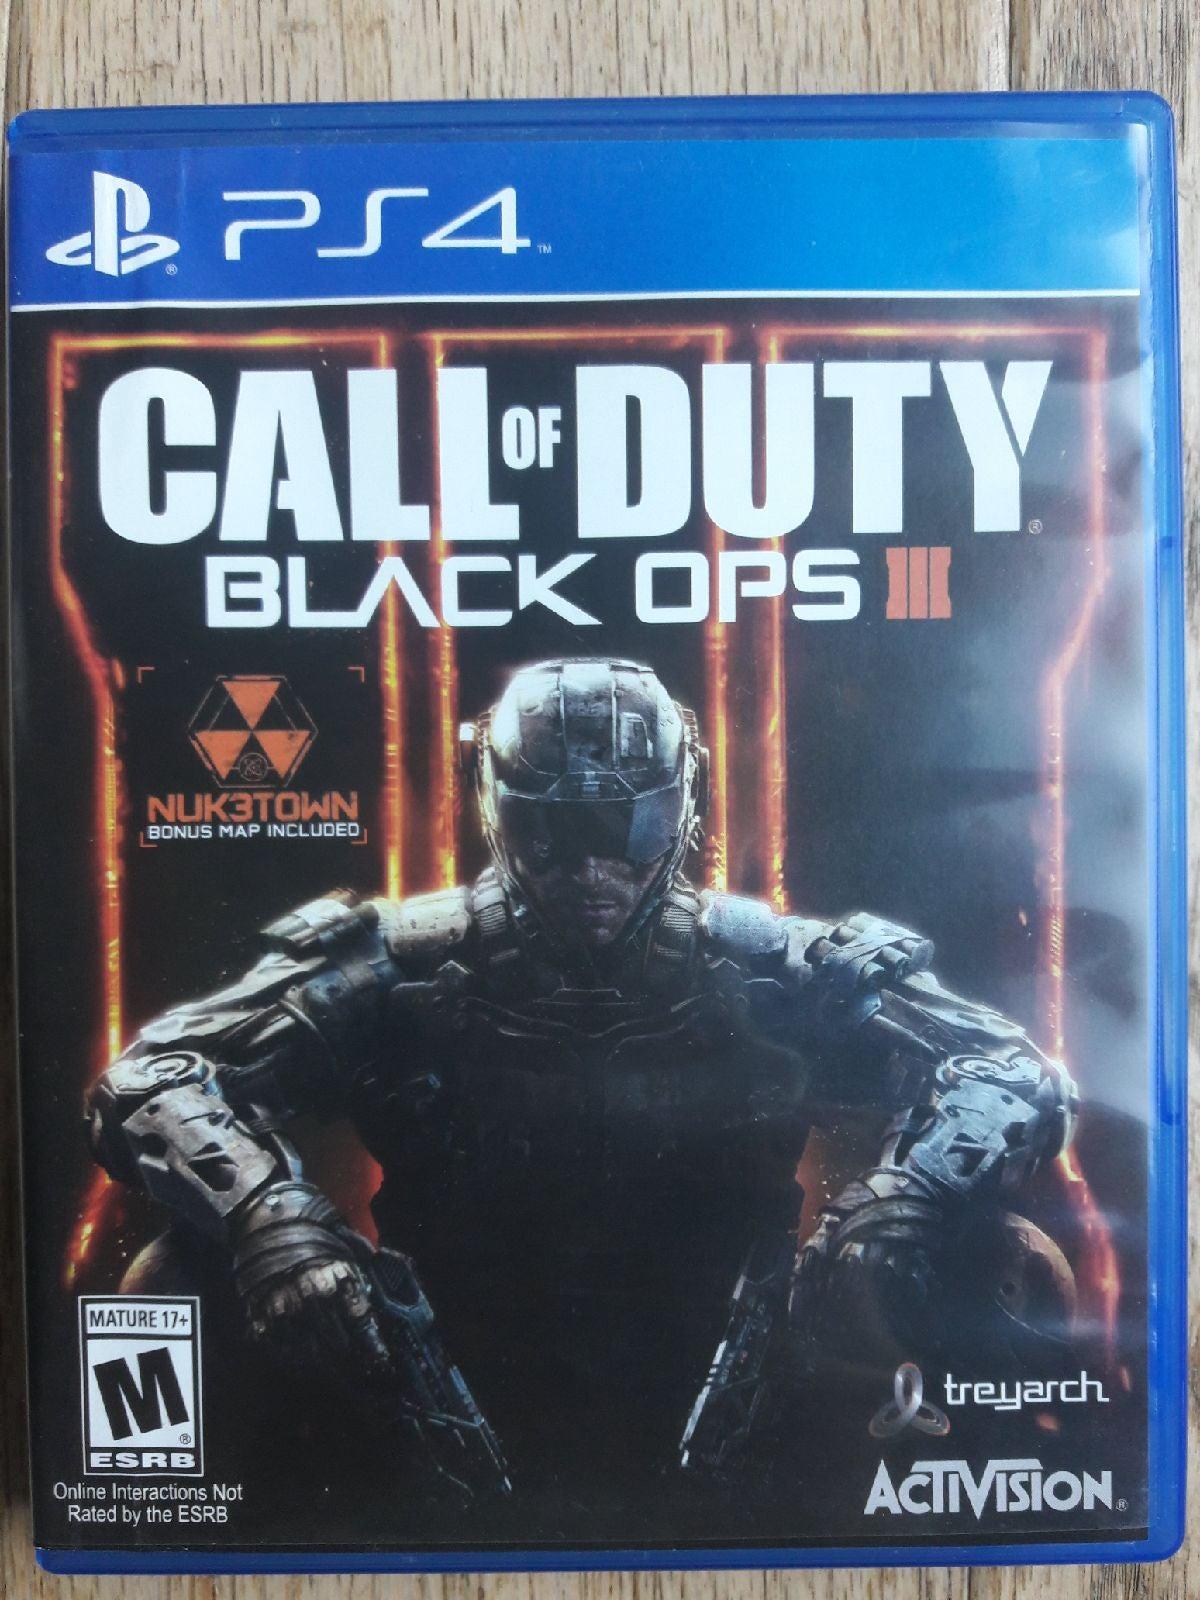 Call of Duty: Black Ops III on Playstati